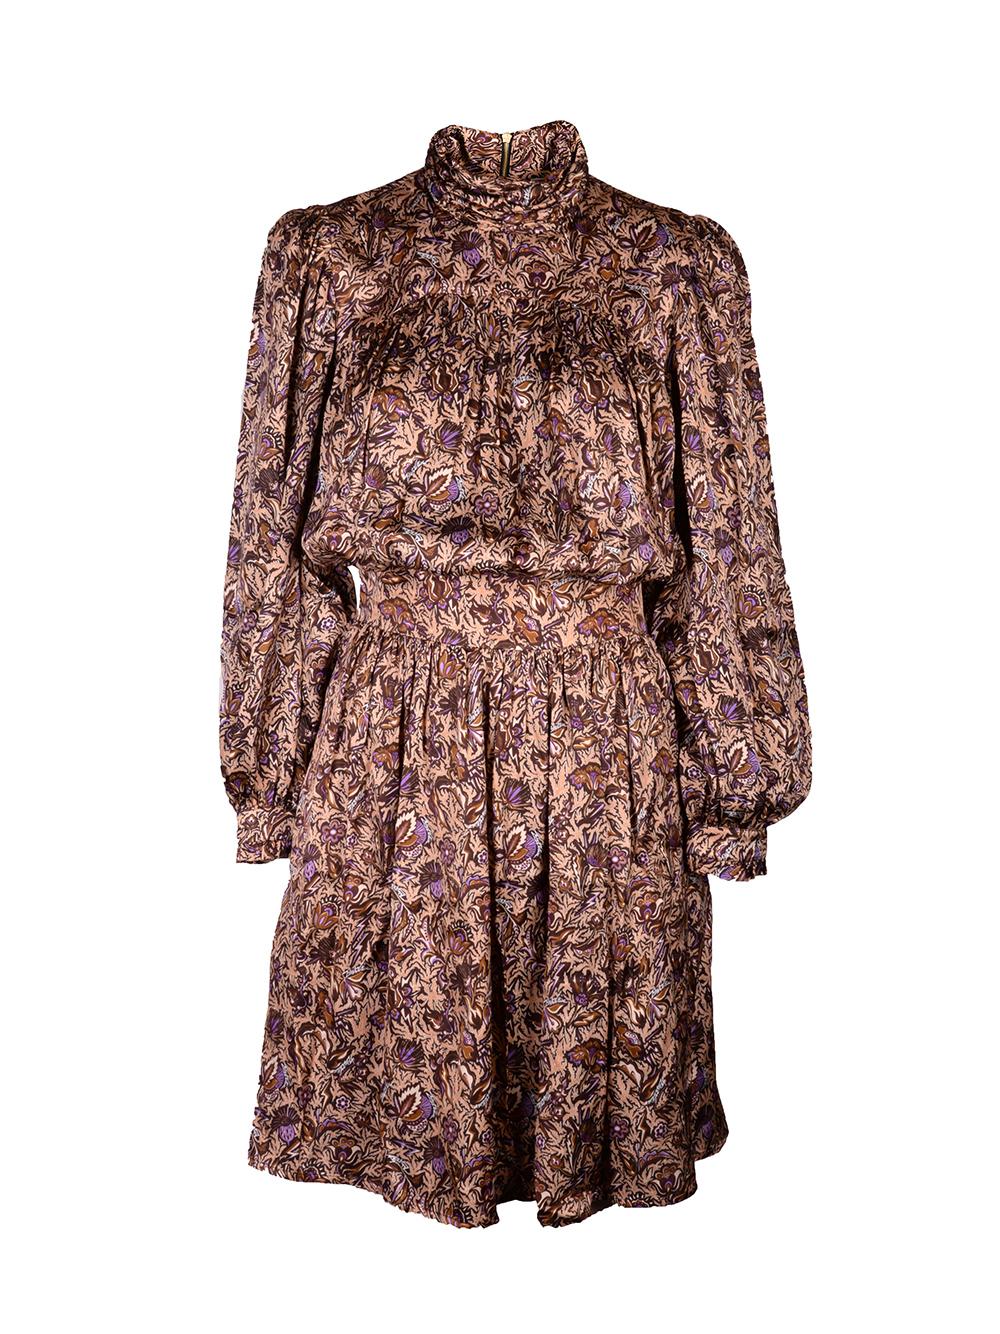 ZADIG & VOLTAIRE Φόρεμα κοντό WJCDO405F-485 ΕΜΠΡΙΜΕ